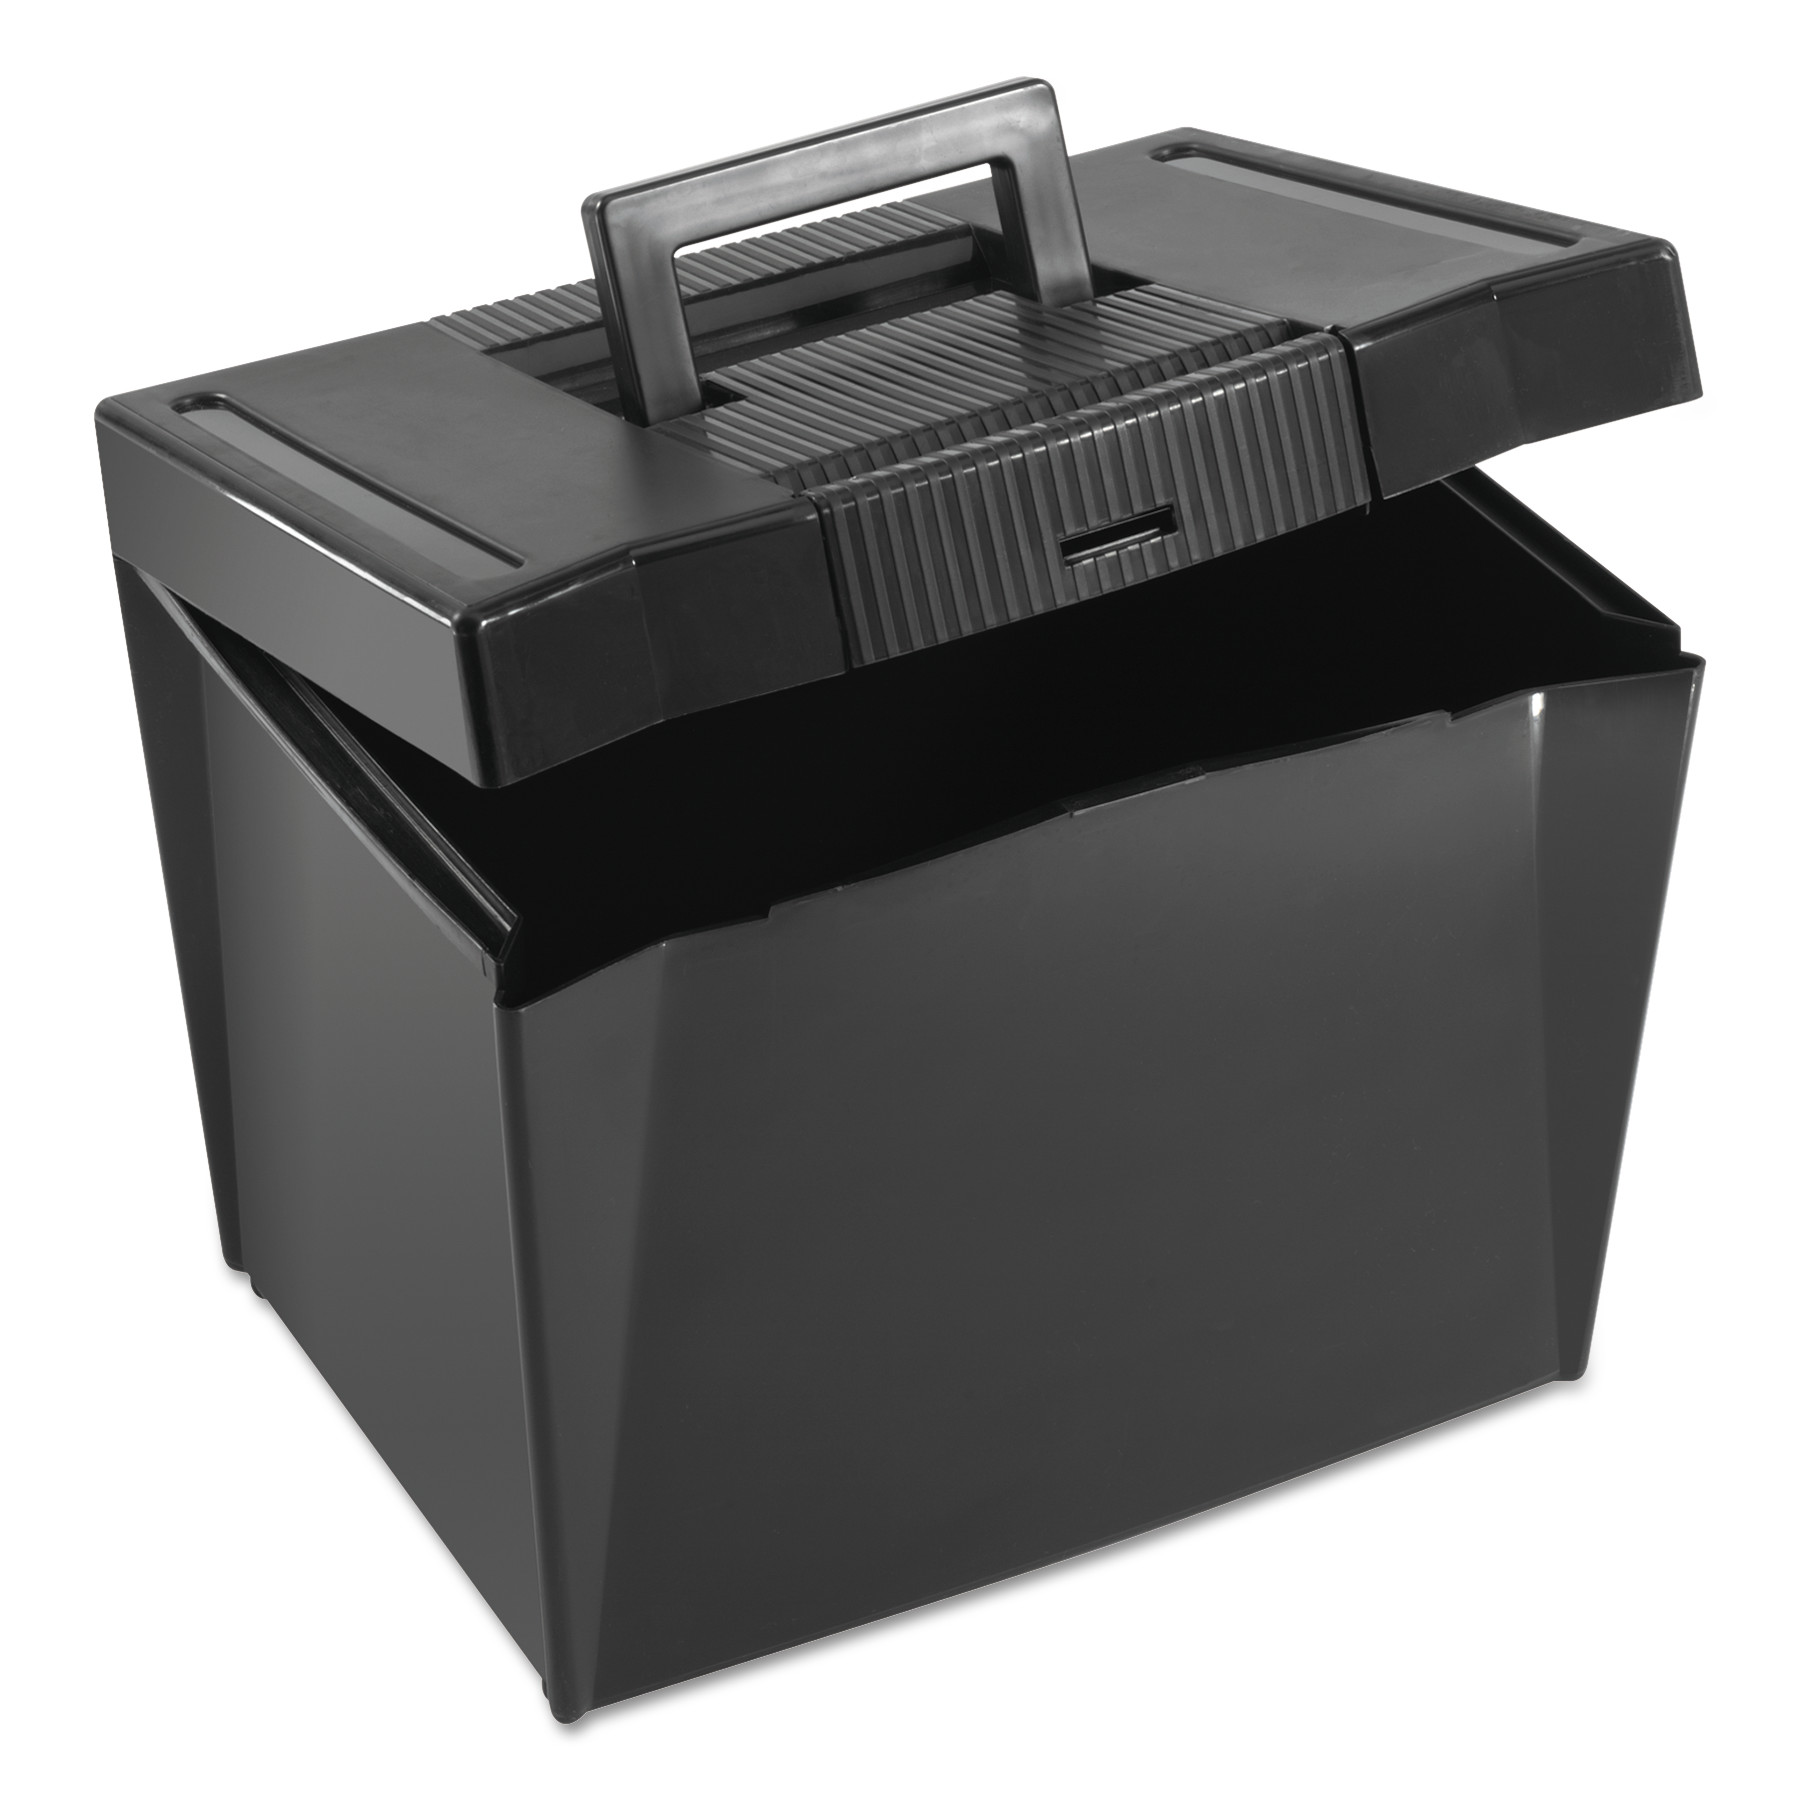 Portable File Storage Box, Letter, Plastic, 13 1/2 x 10 1/4 x 10 7/8